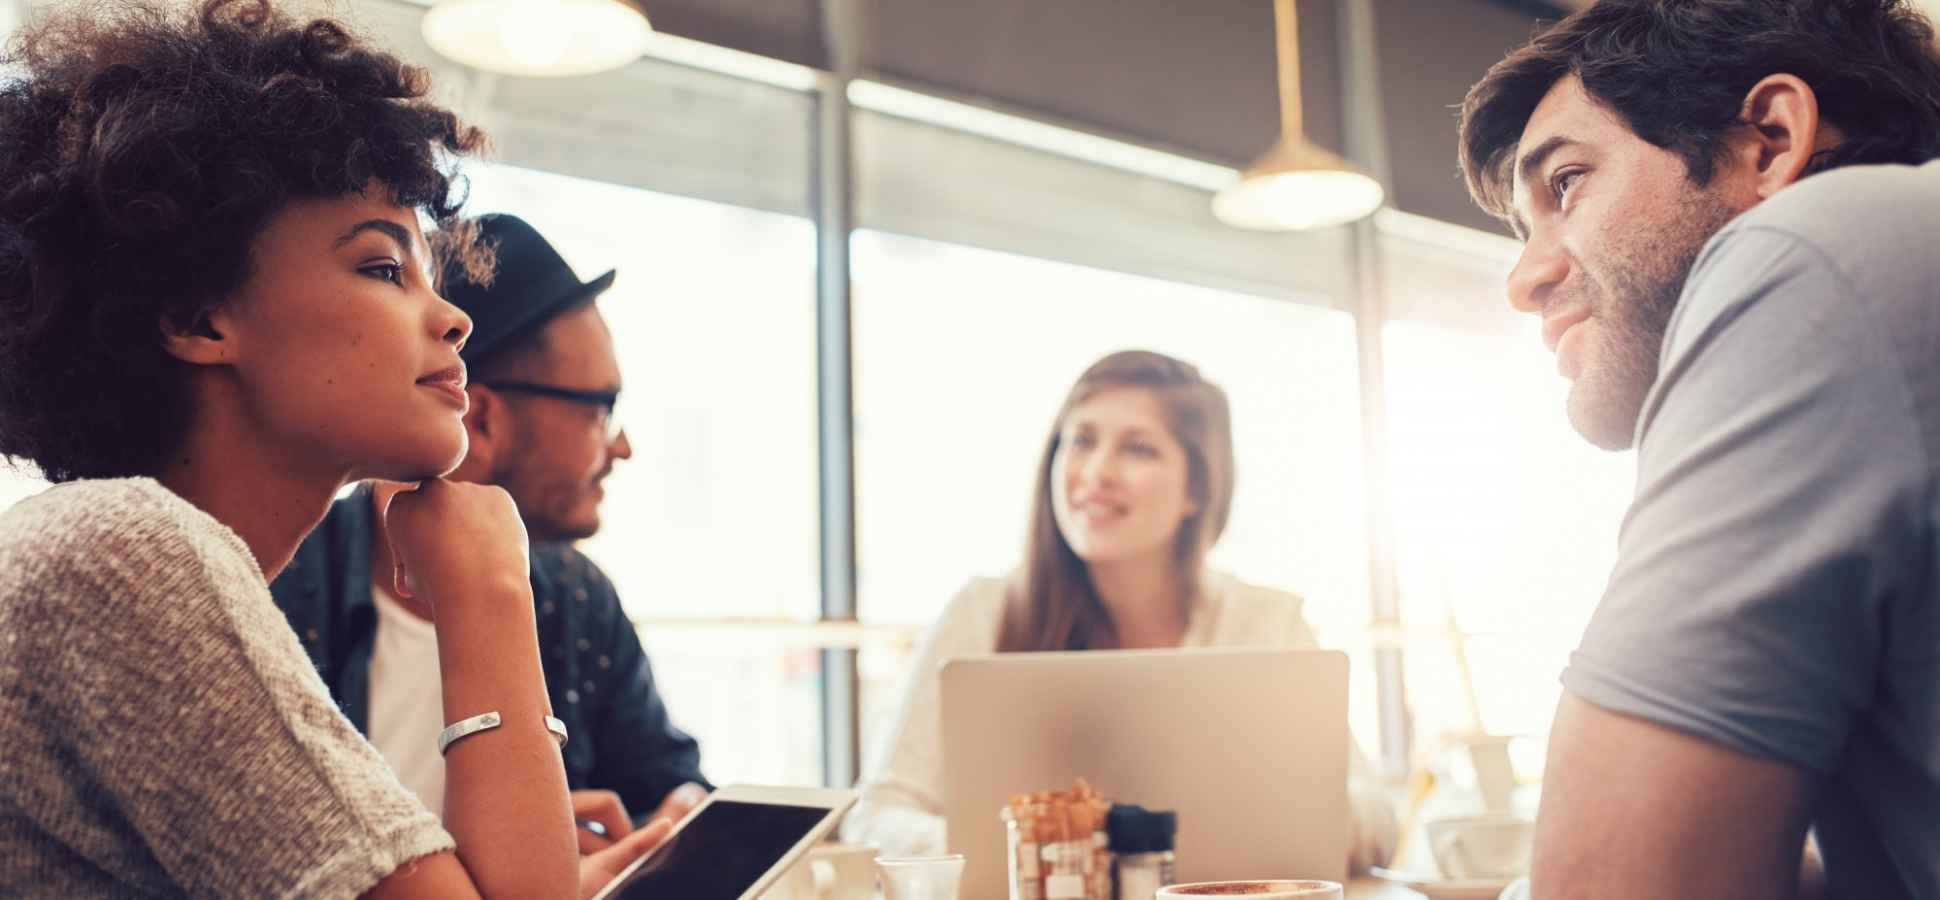 4 Conversational Habits That Successful People Always Practice